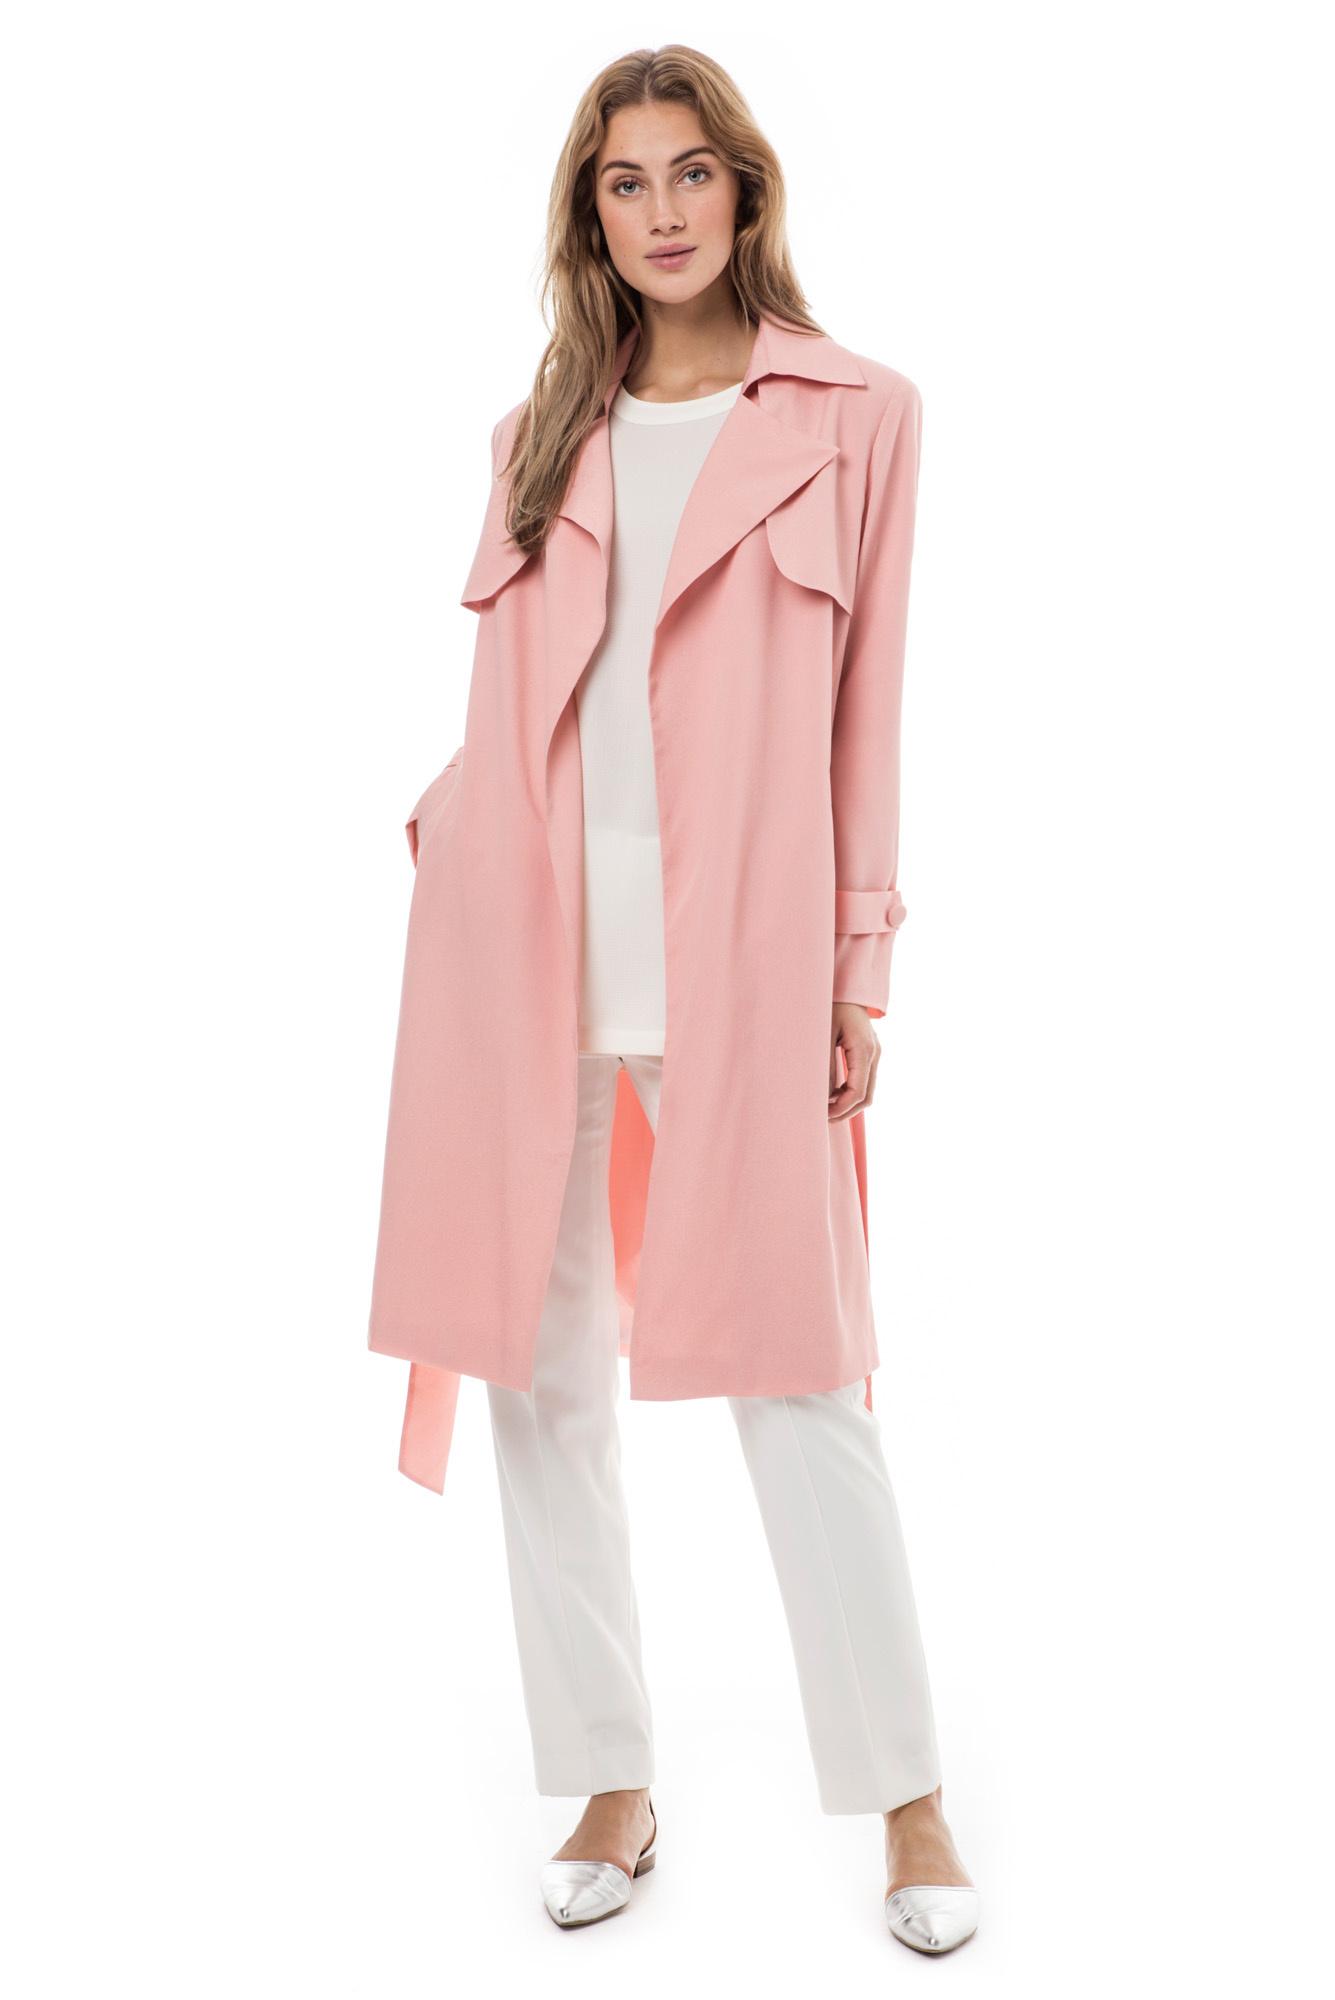 315_85e989ef19-zina-trench-pink-1-by-malina-big.jpg